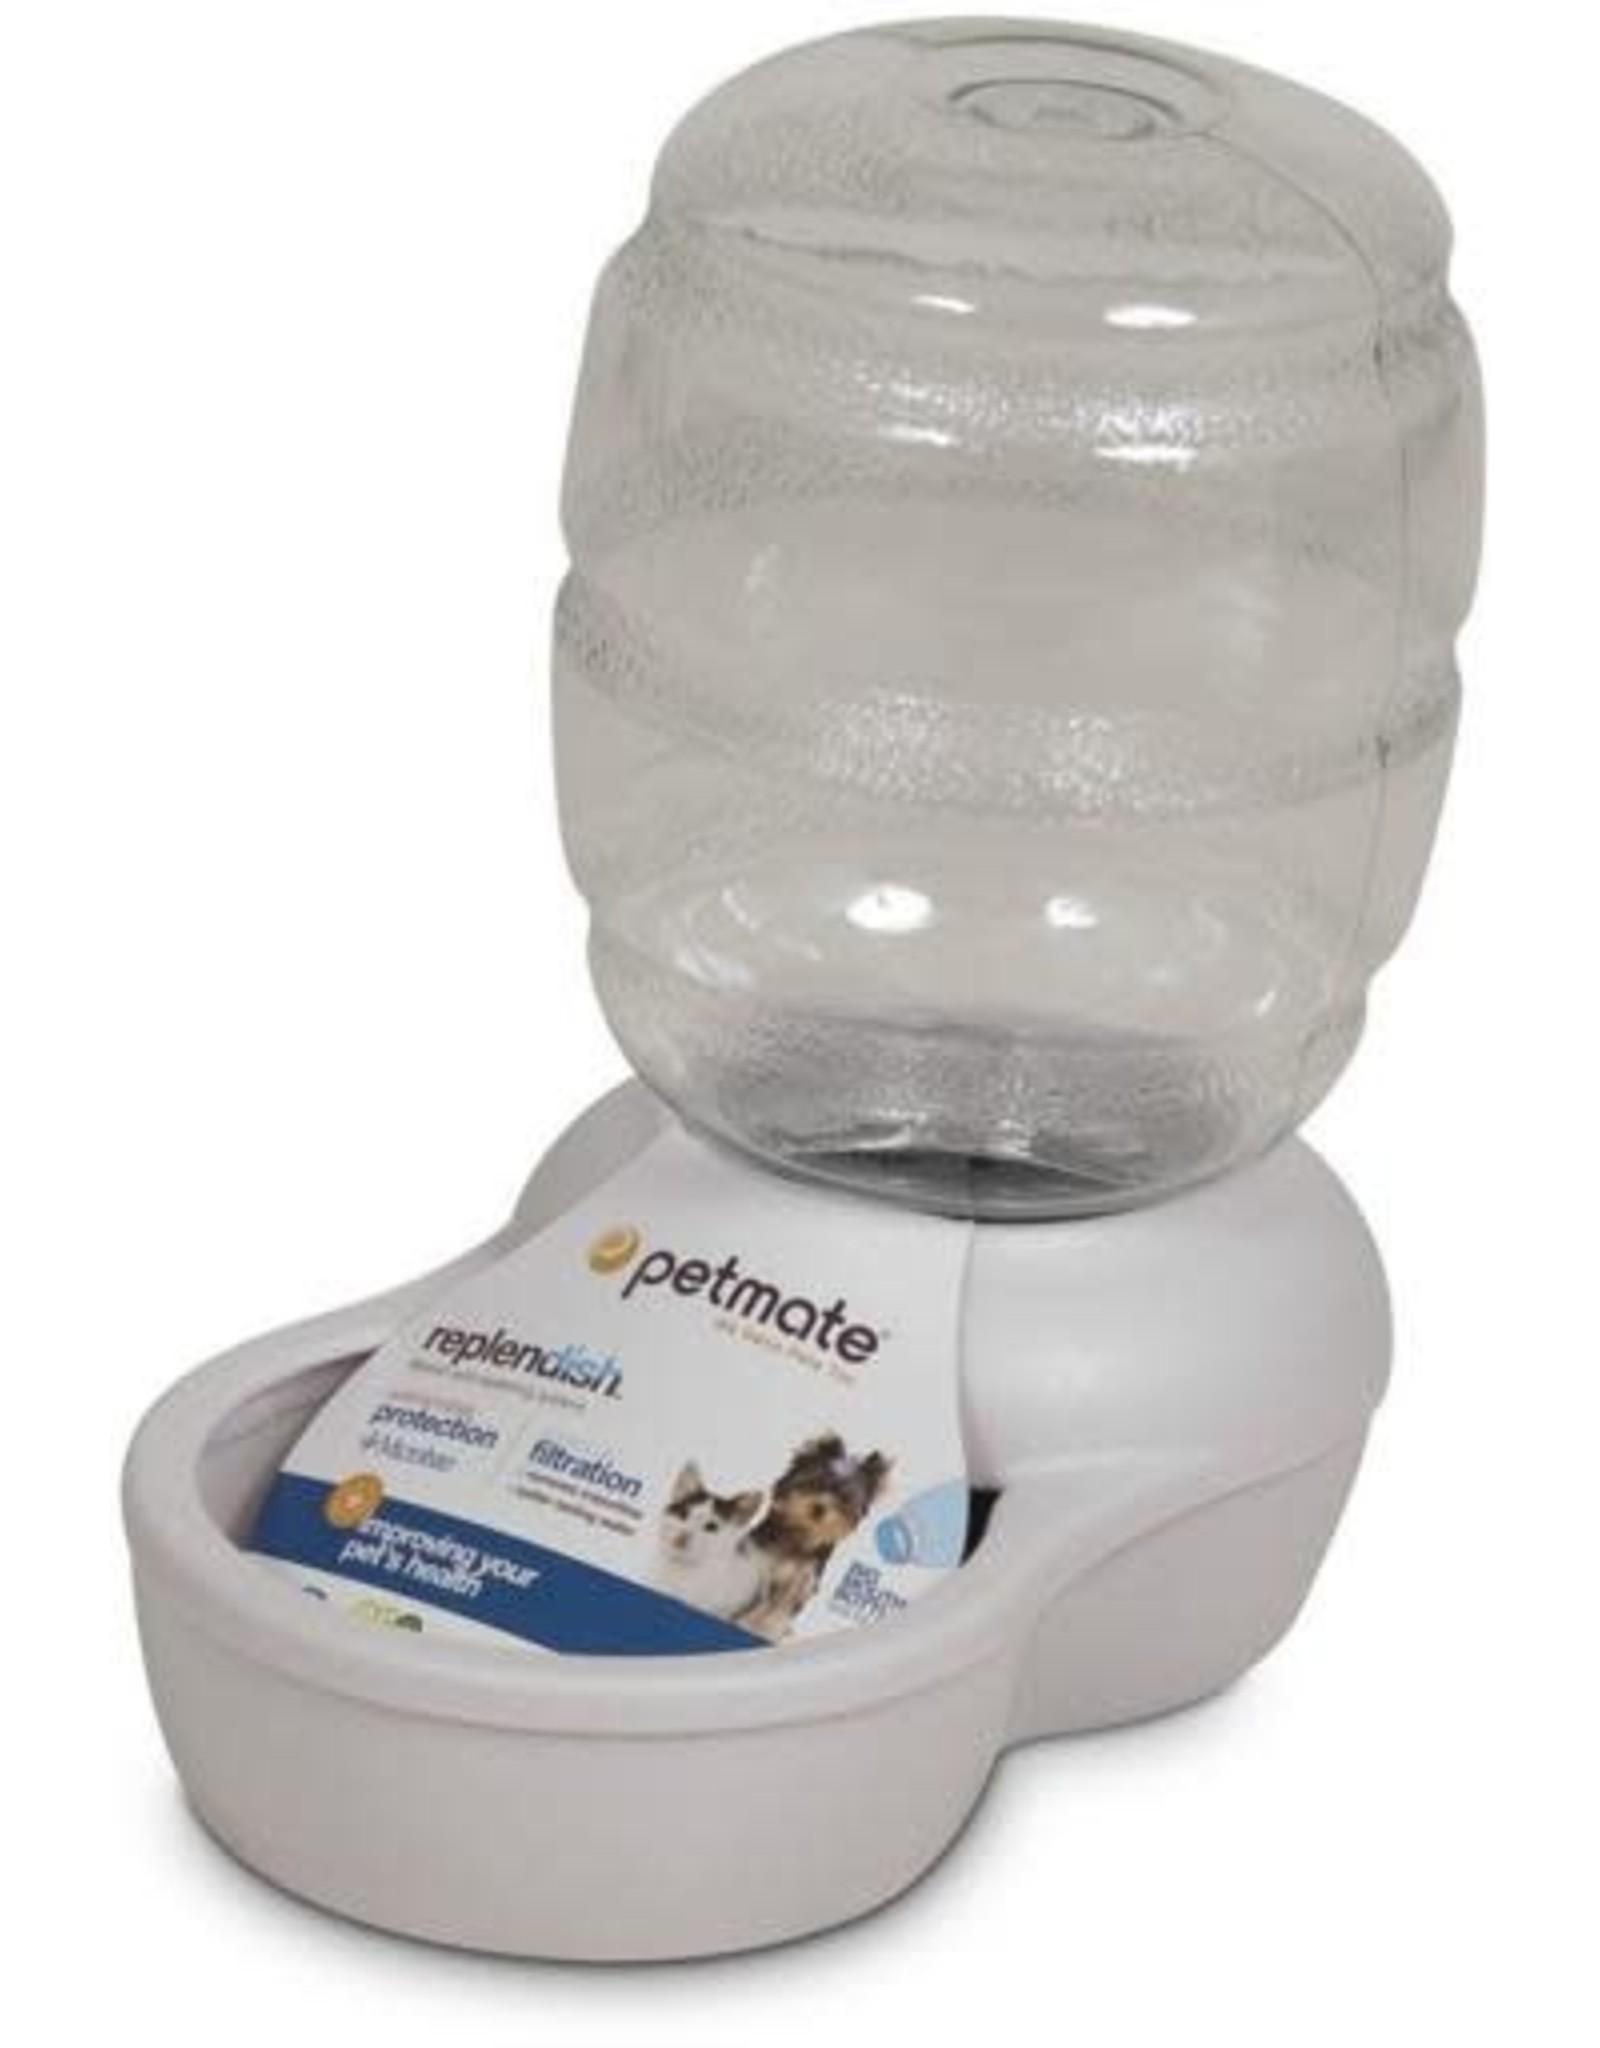 Petmate Petmate Replendish Waterer with Microban